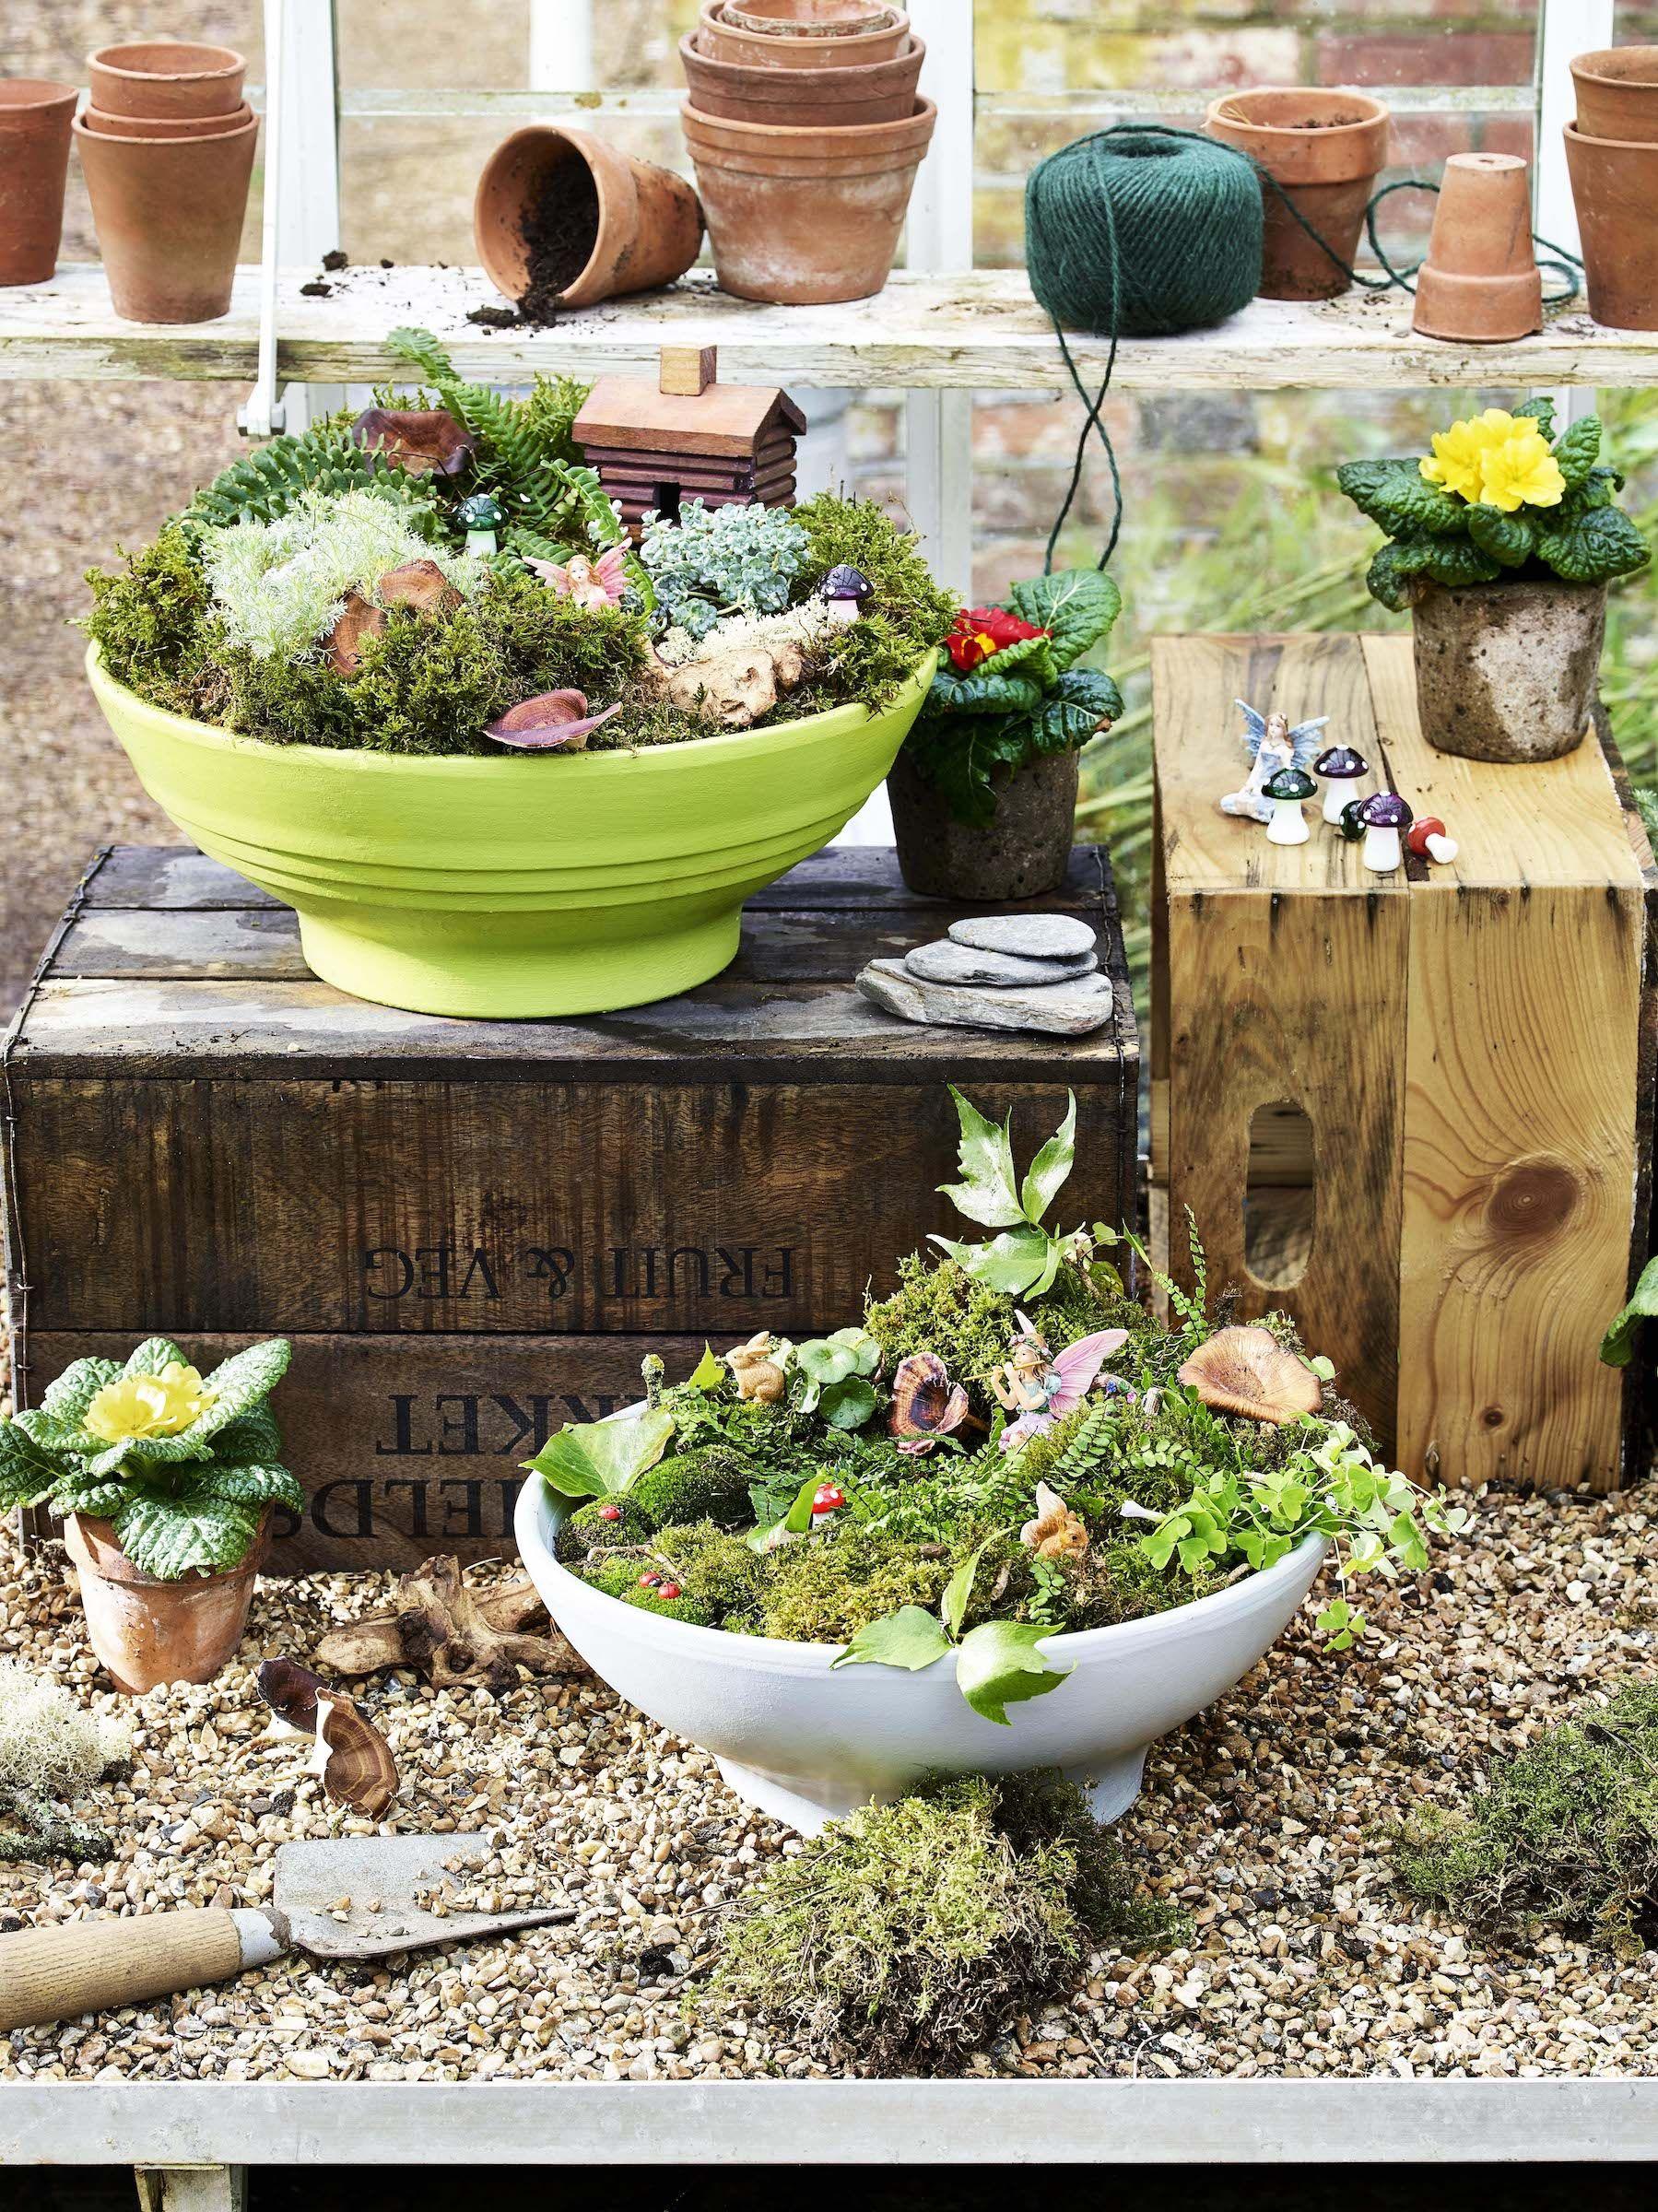 5 brilliant DIY garden ideas to try